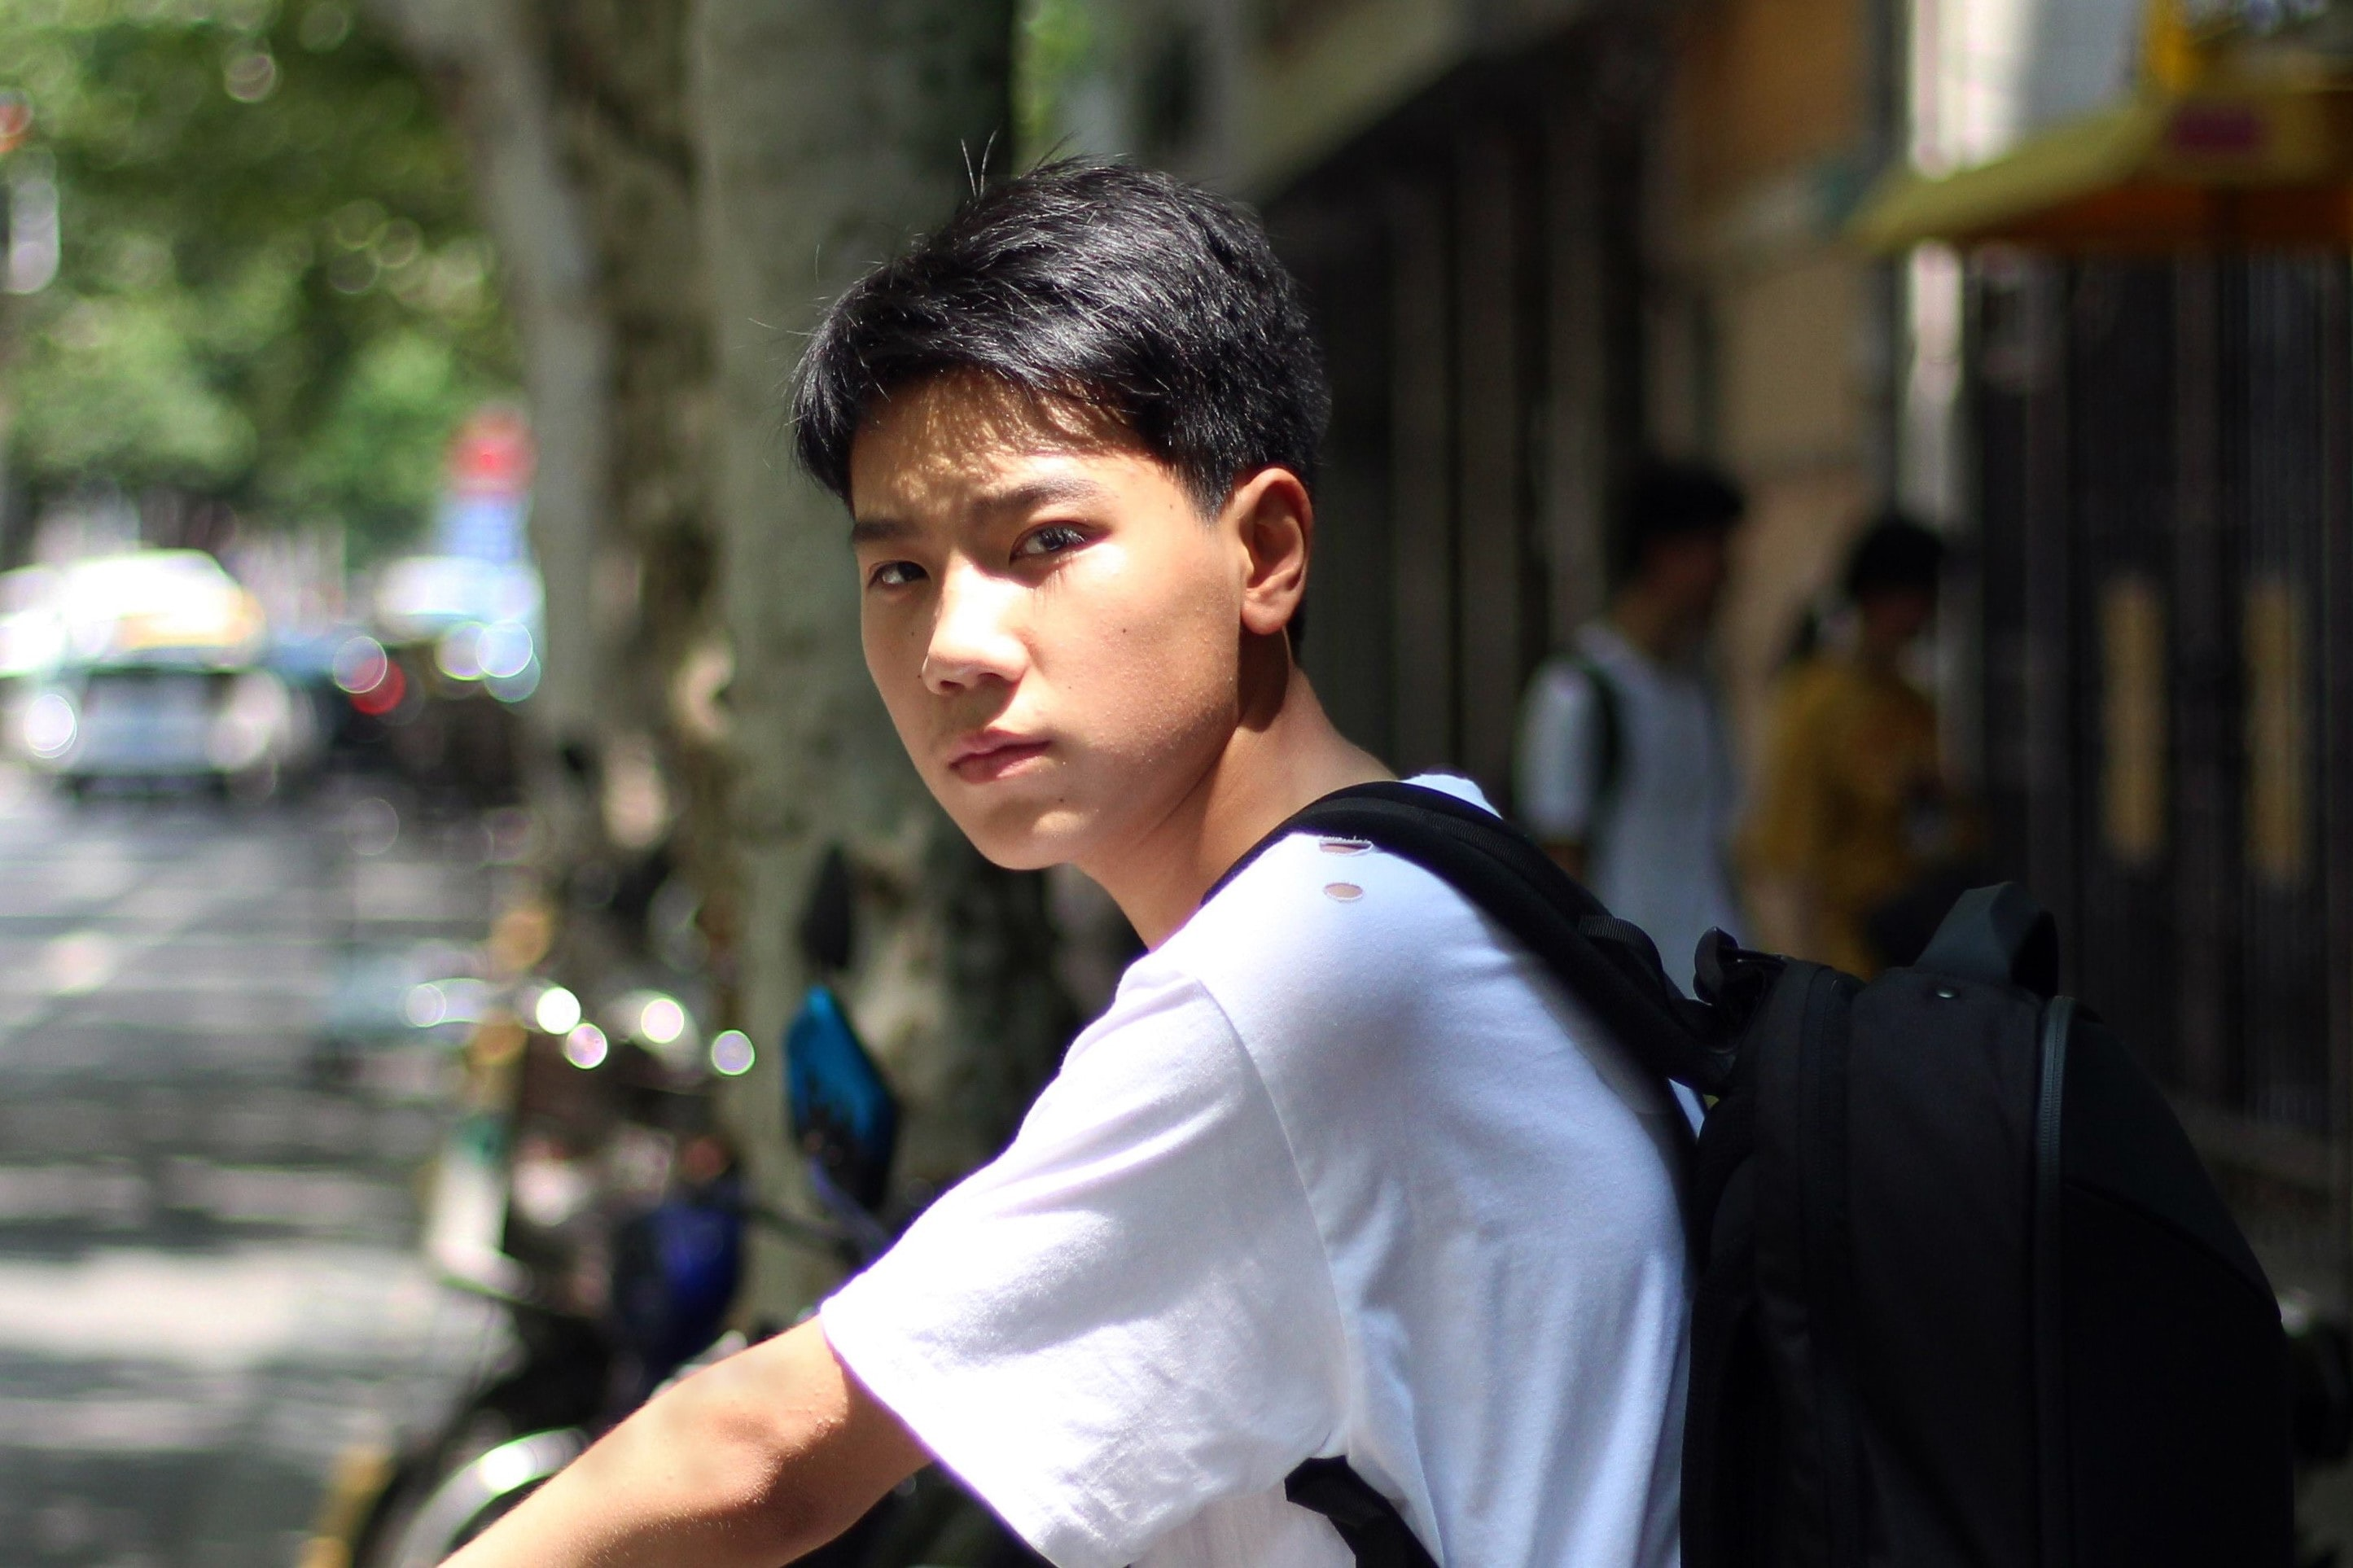 Go to Muyuan Ma's profile